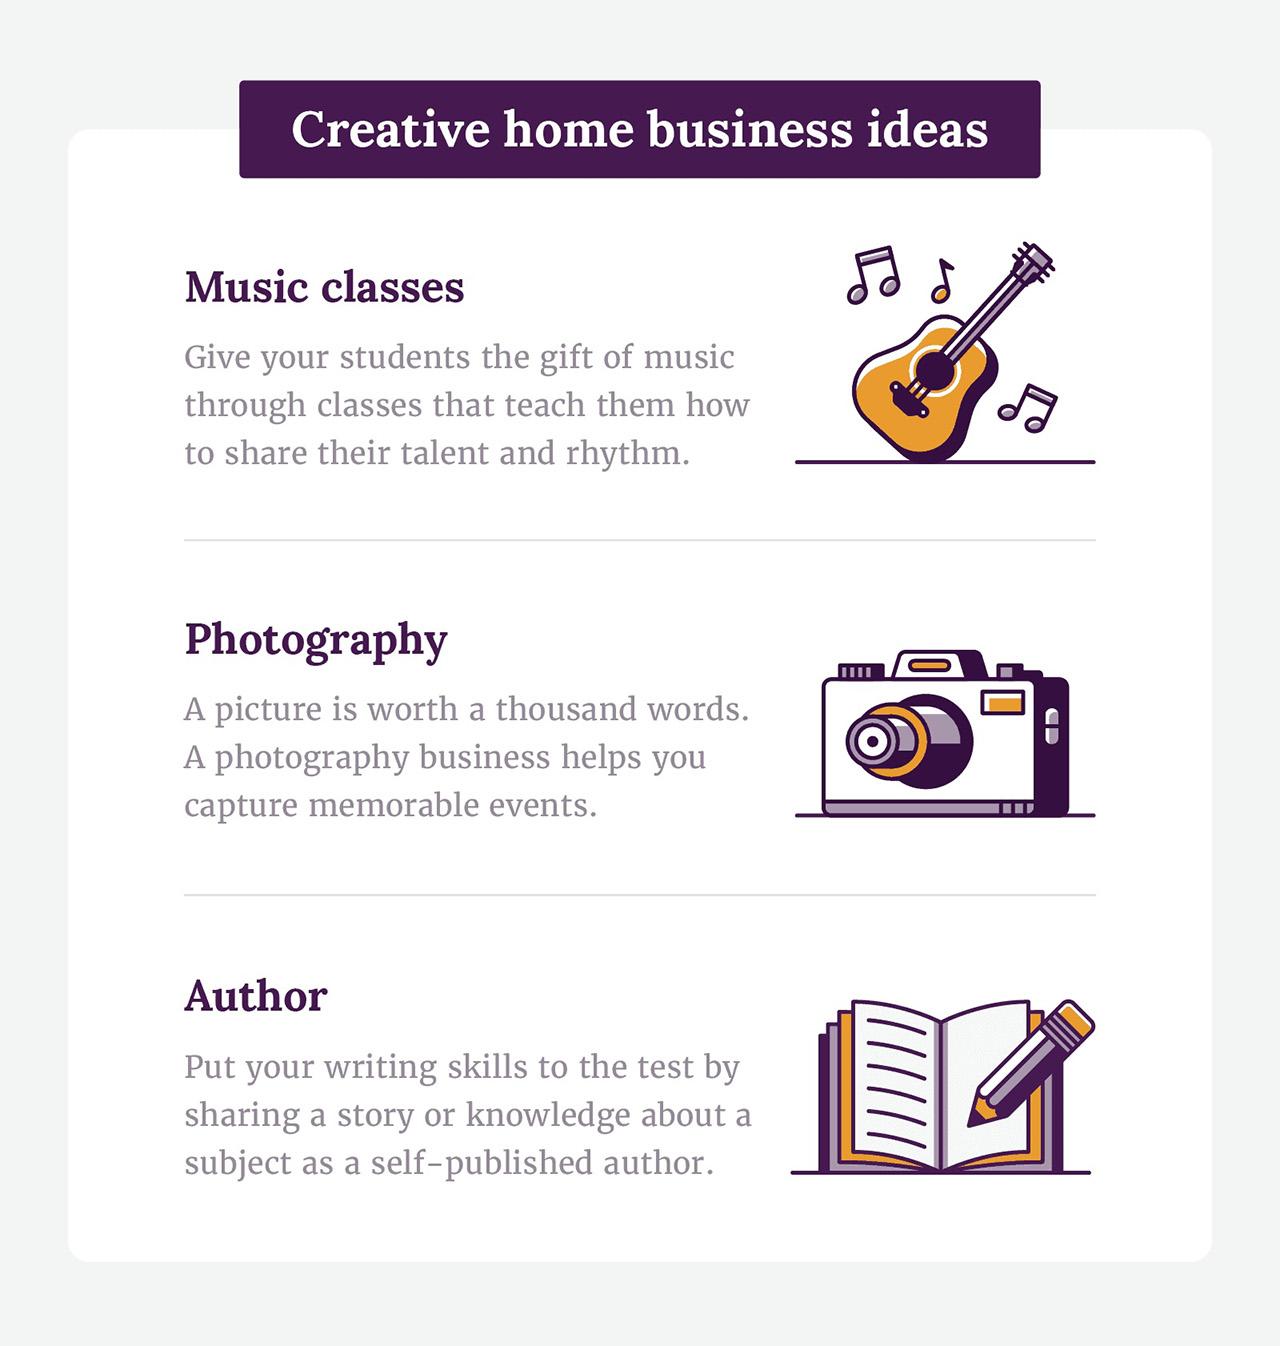 Creative home business ideas